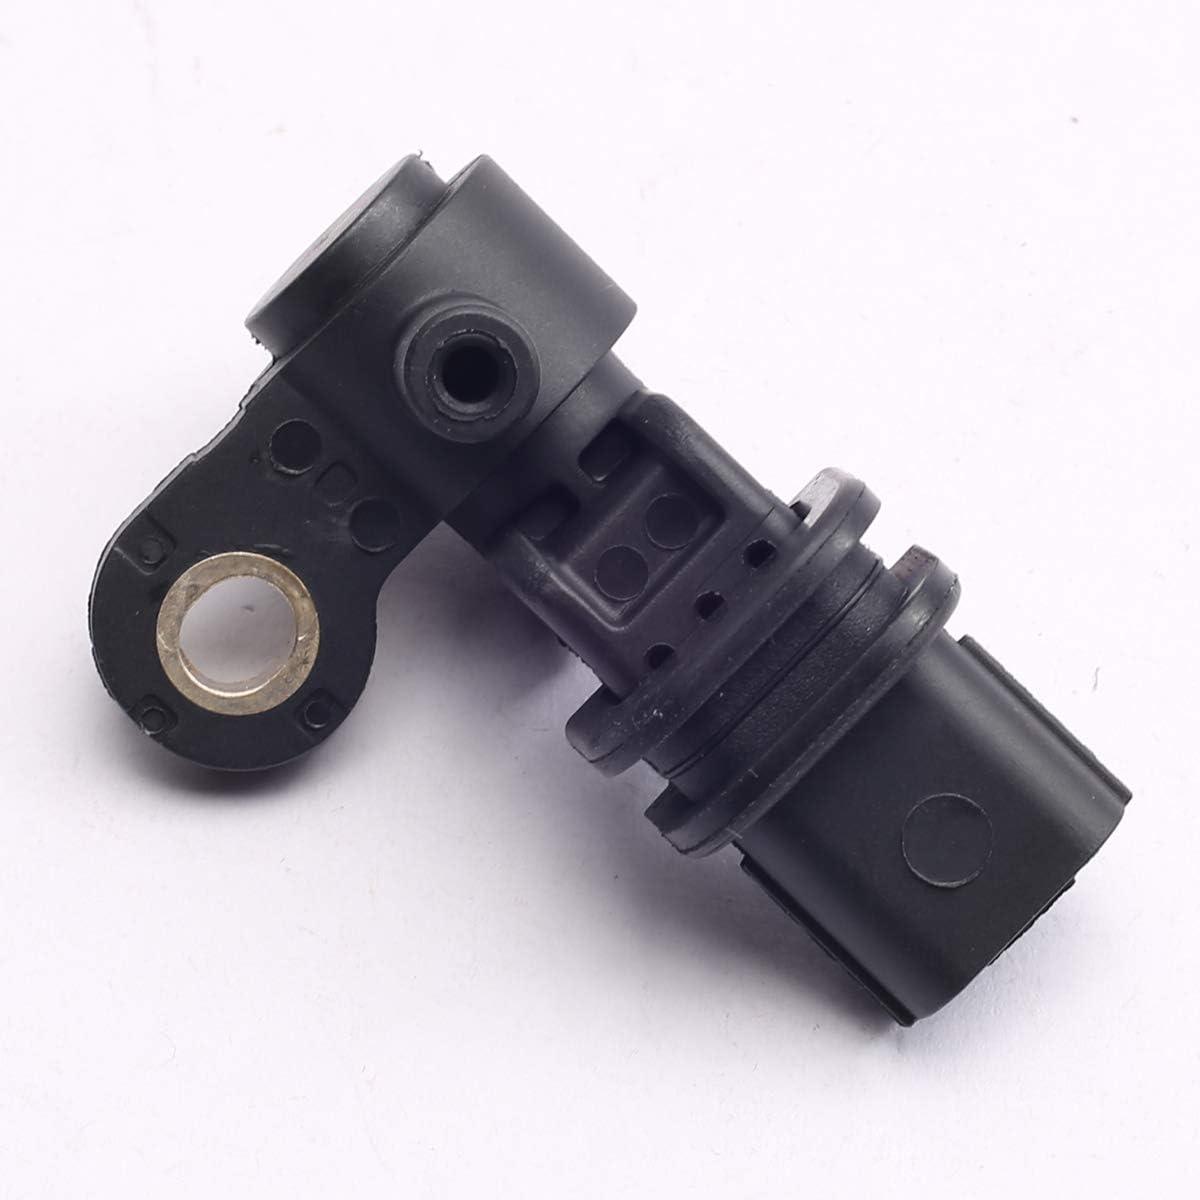 2001-2005 Honda Civic CENTAURUS Crankshaft Position Sensor Replacement for 2003-2001 Acura EL Replace# 37500PLC005 37500PLC015 SU5582 5S1767 1962001 71-4942 CPS sensor